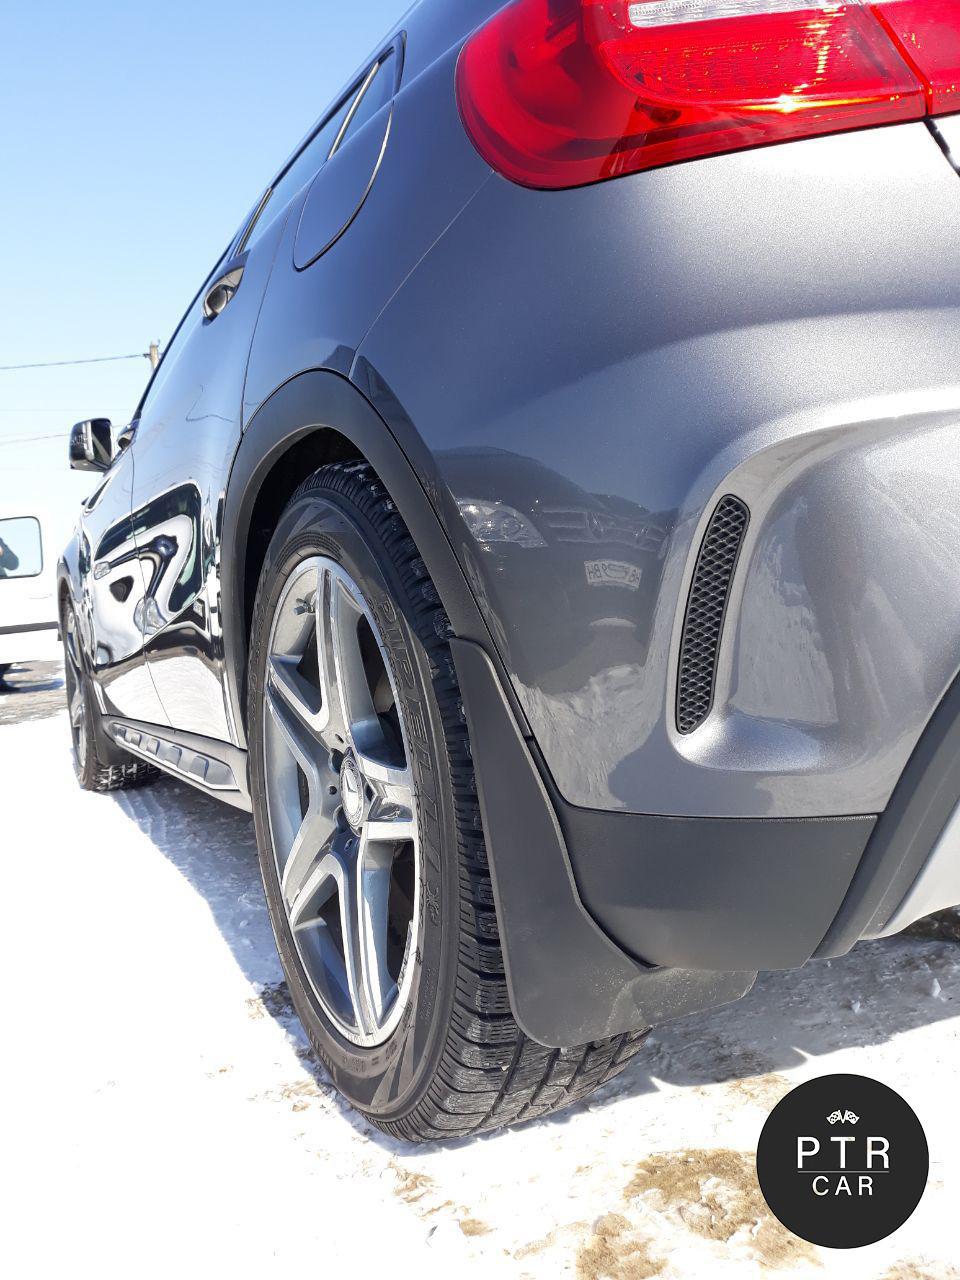 Брызговики BMW X5 (Е70) 2007-2013 (задние кт 2шт)